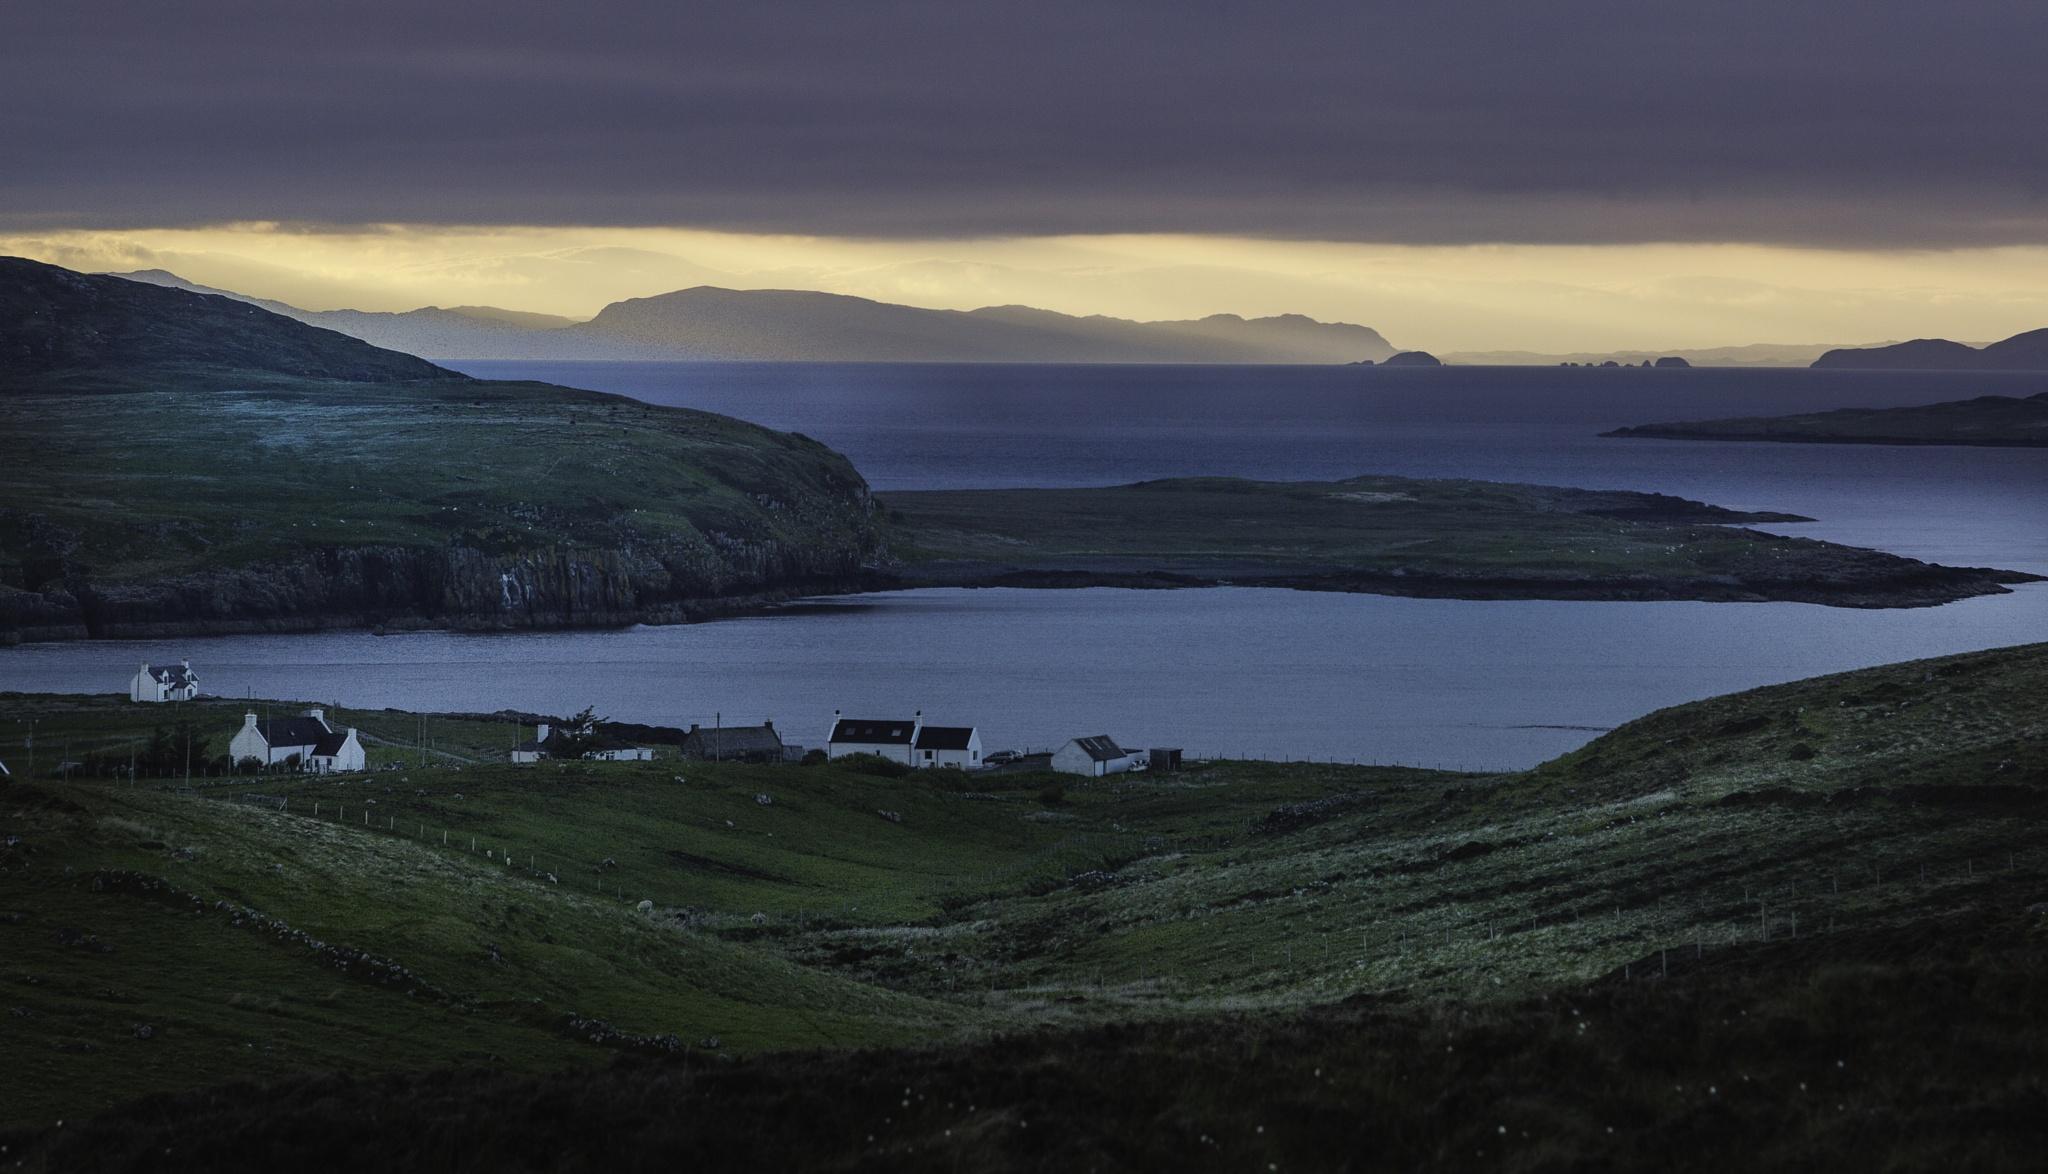 Sunset on Skye by Bpiglia1